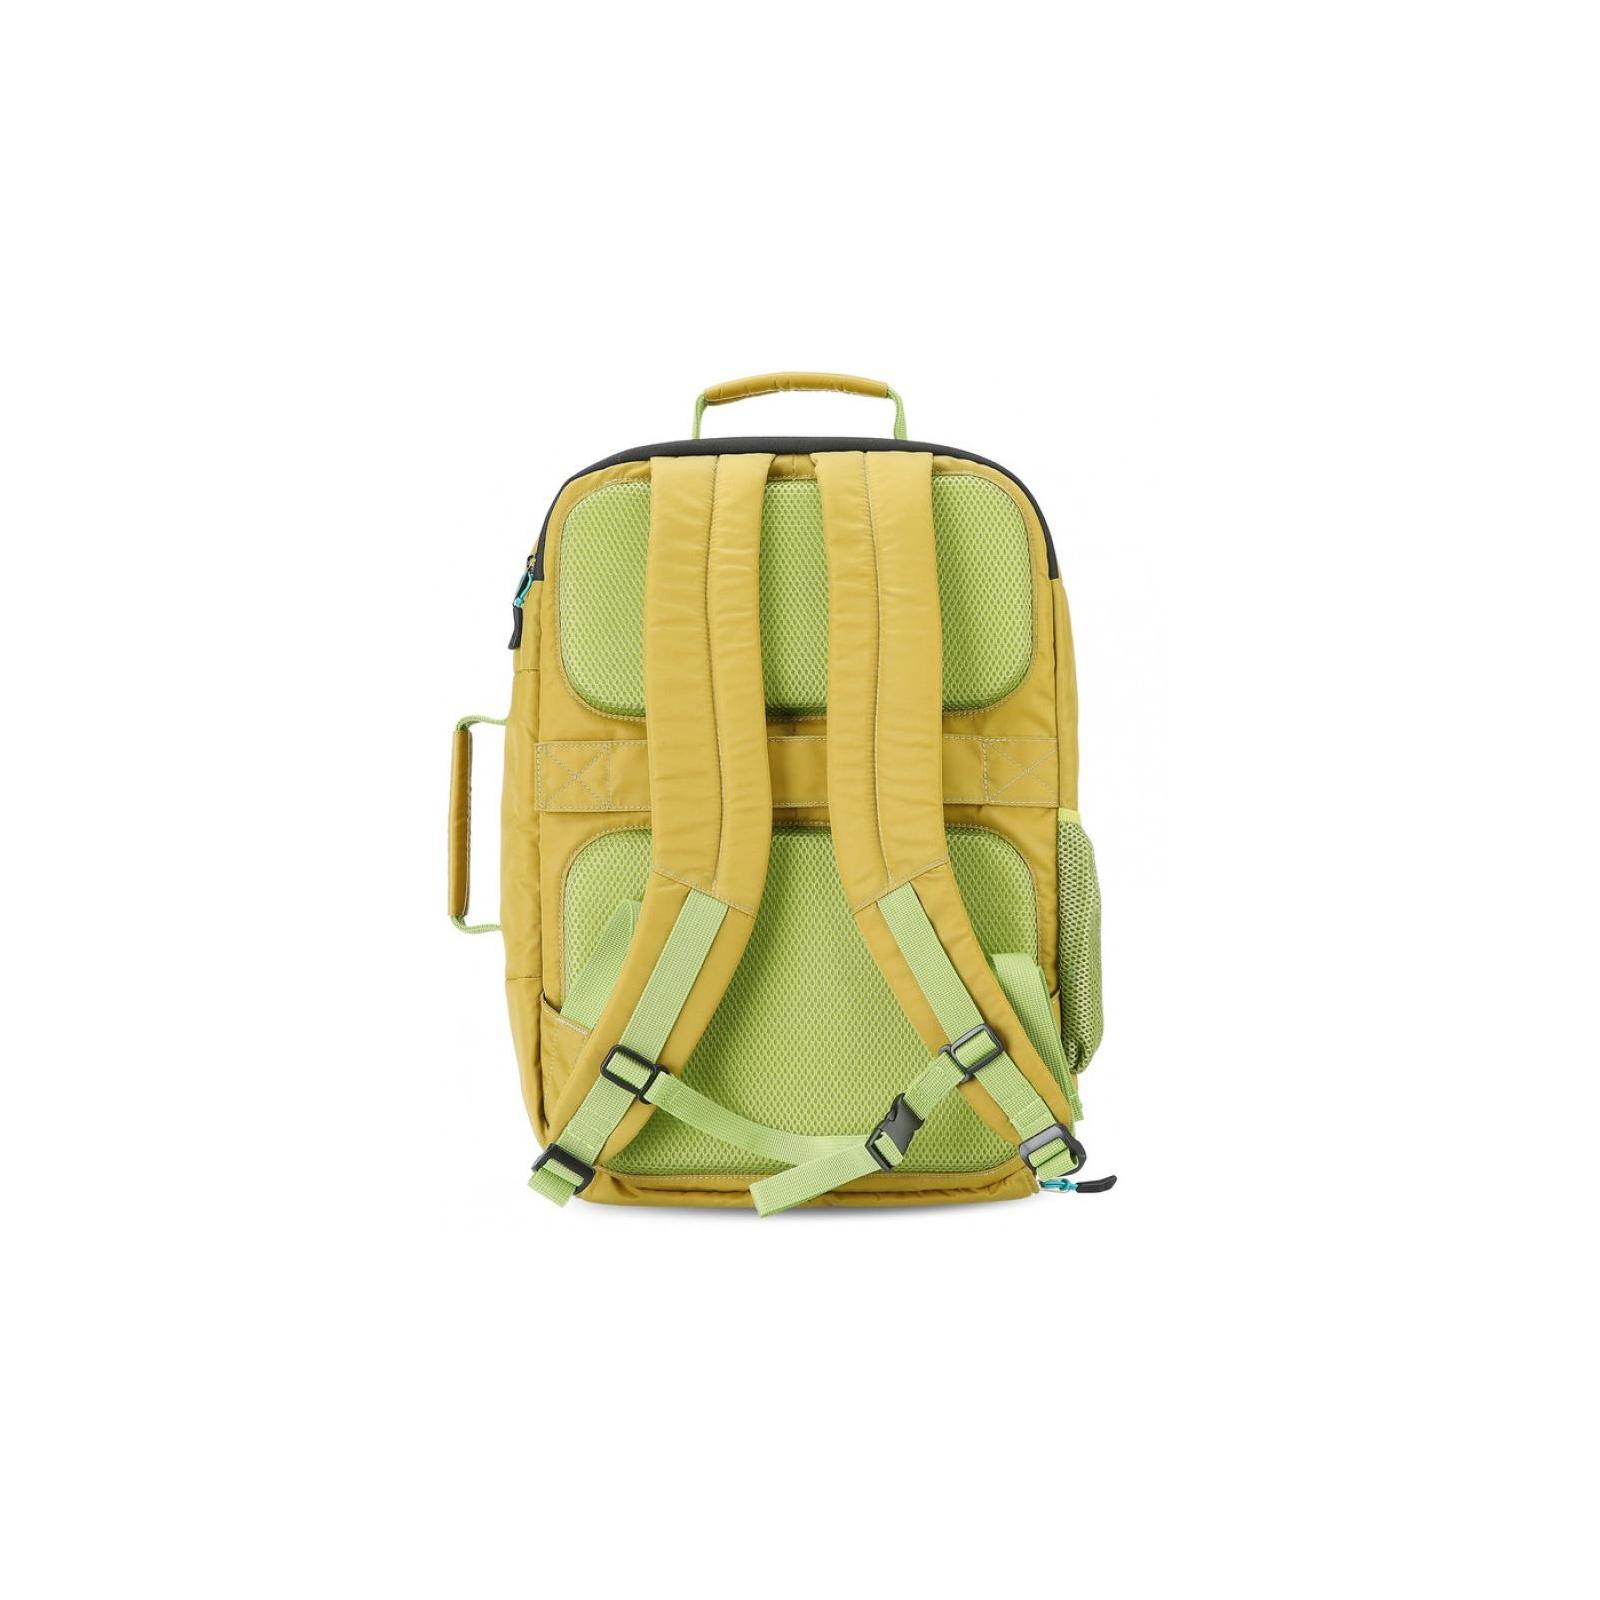 Рюкзак Tucano Sport Mister зелёный (BKMR-V) изображение 4